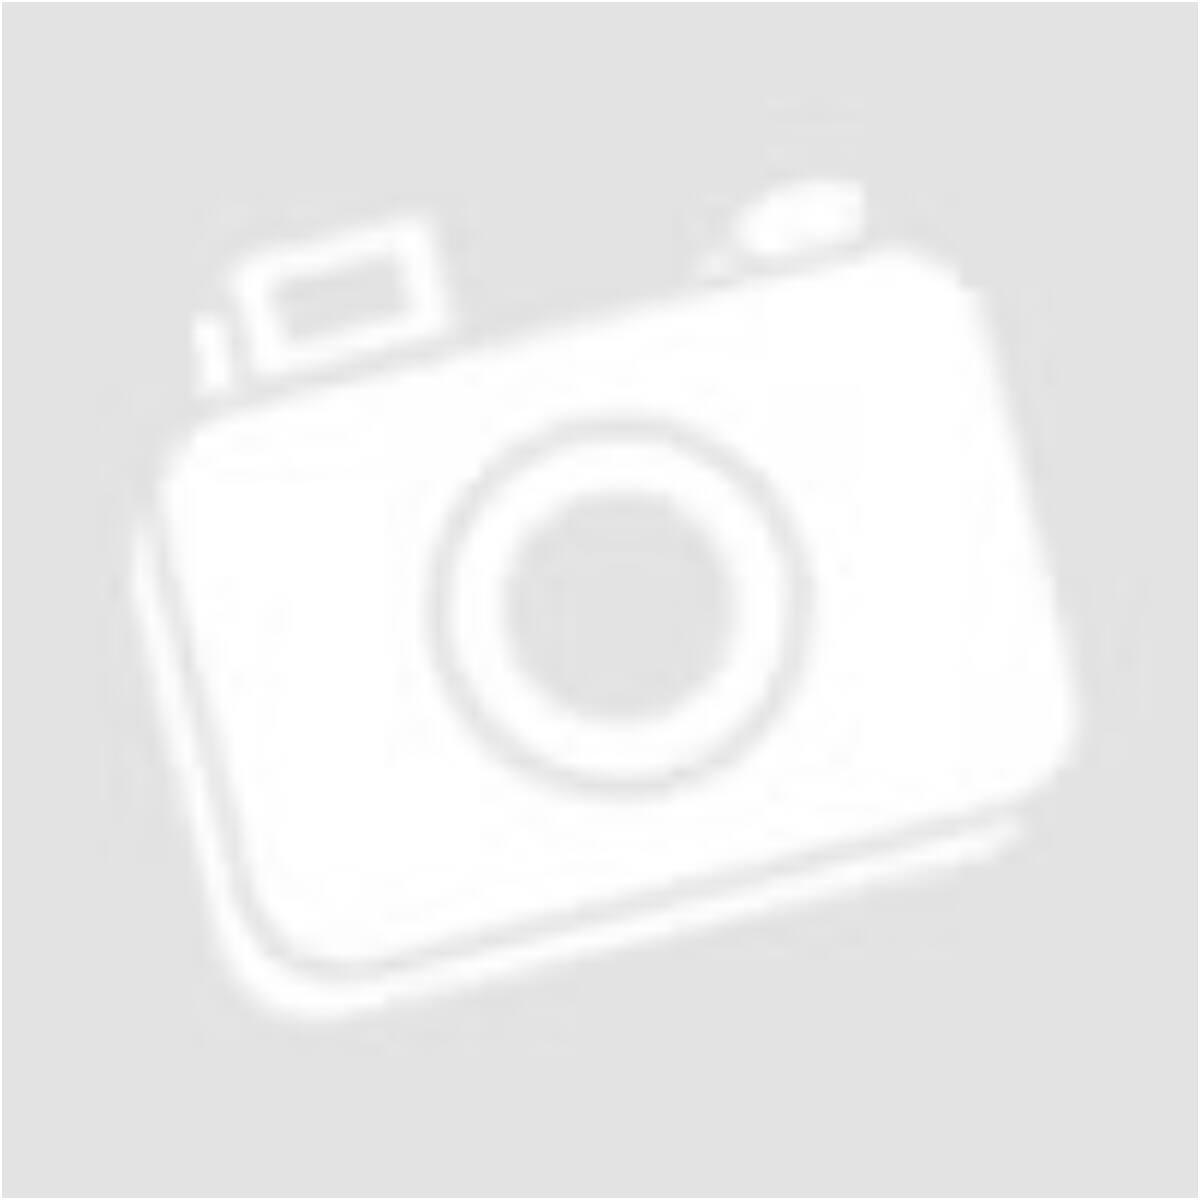 RIGHT III átmeneti műbőr dzseki  EX706 - kék - Átmeneti (őszi ... b3c6ecb736